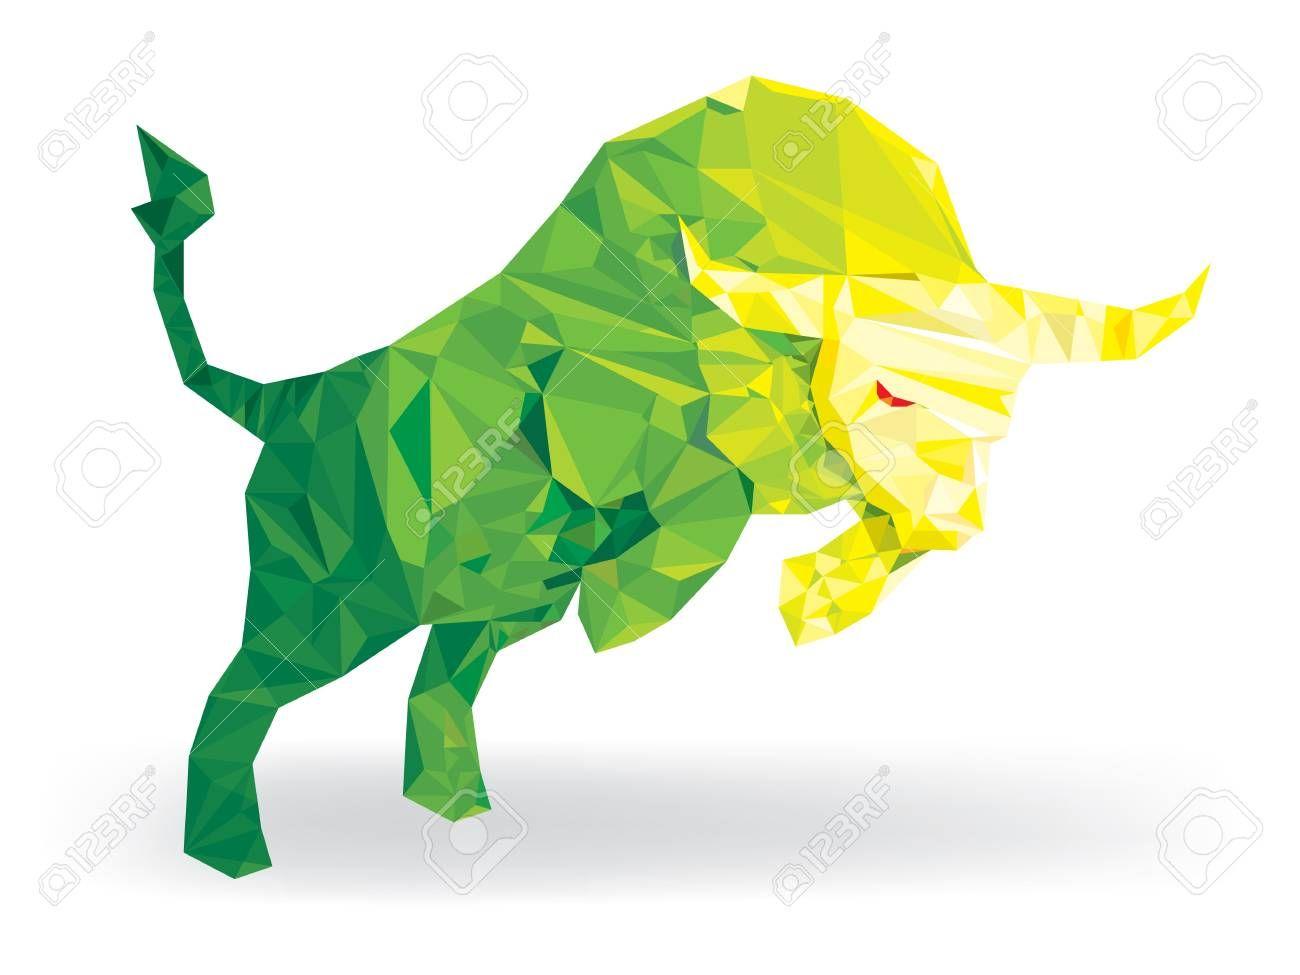 Bull Geomatric Pattern Lowpolygon Bullish Symbols On Stock Market Vector Illustration Sponsored Lowpolygon Bul In 2020 Cool Artwork Poster Prints Print Artist